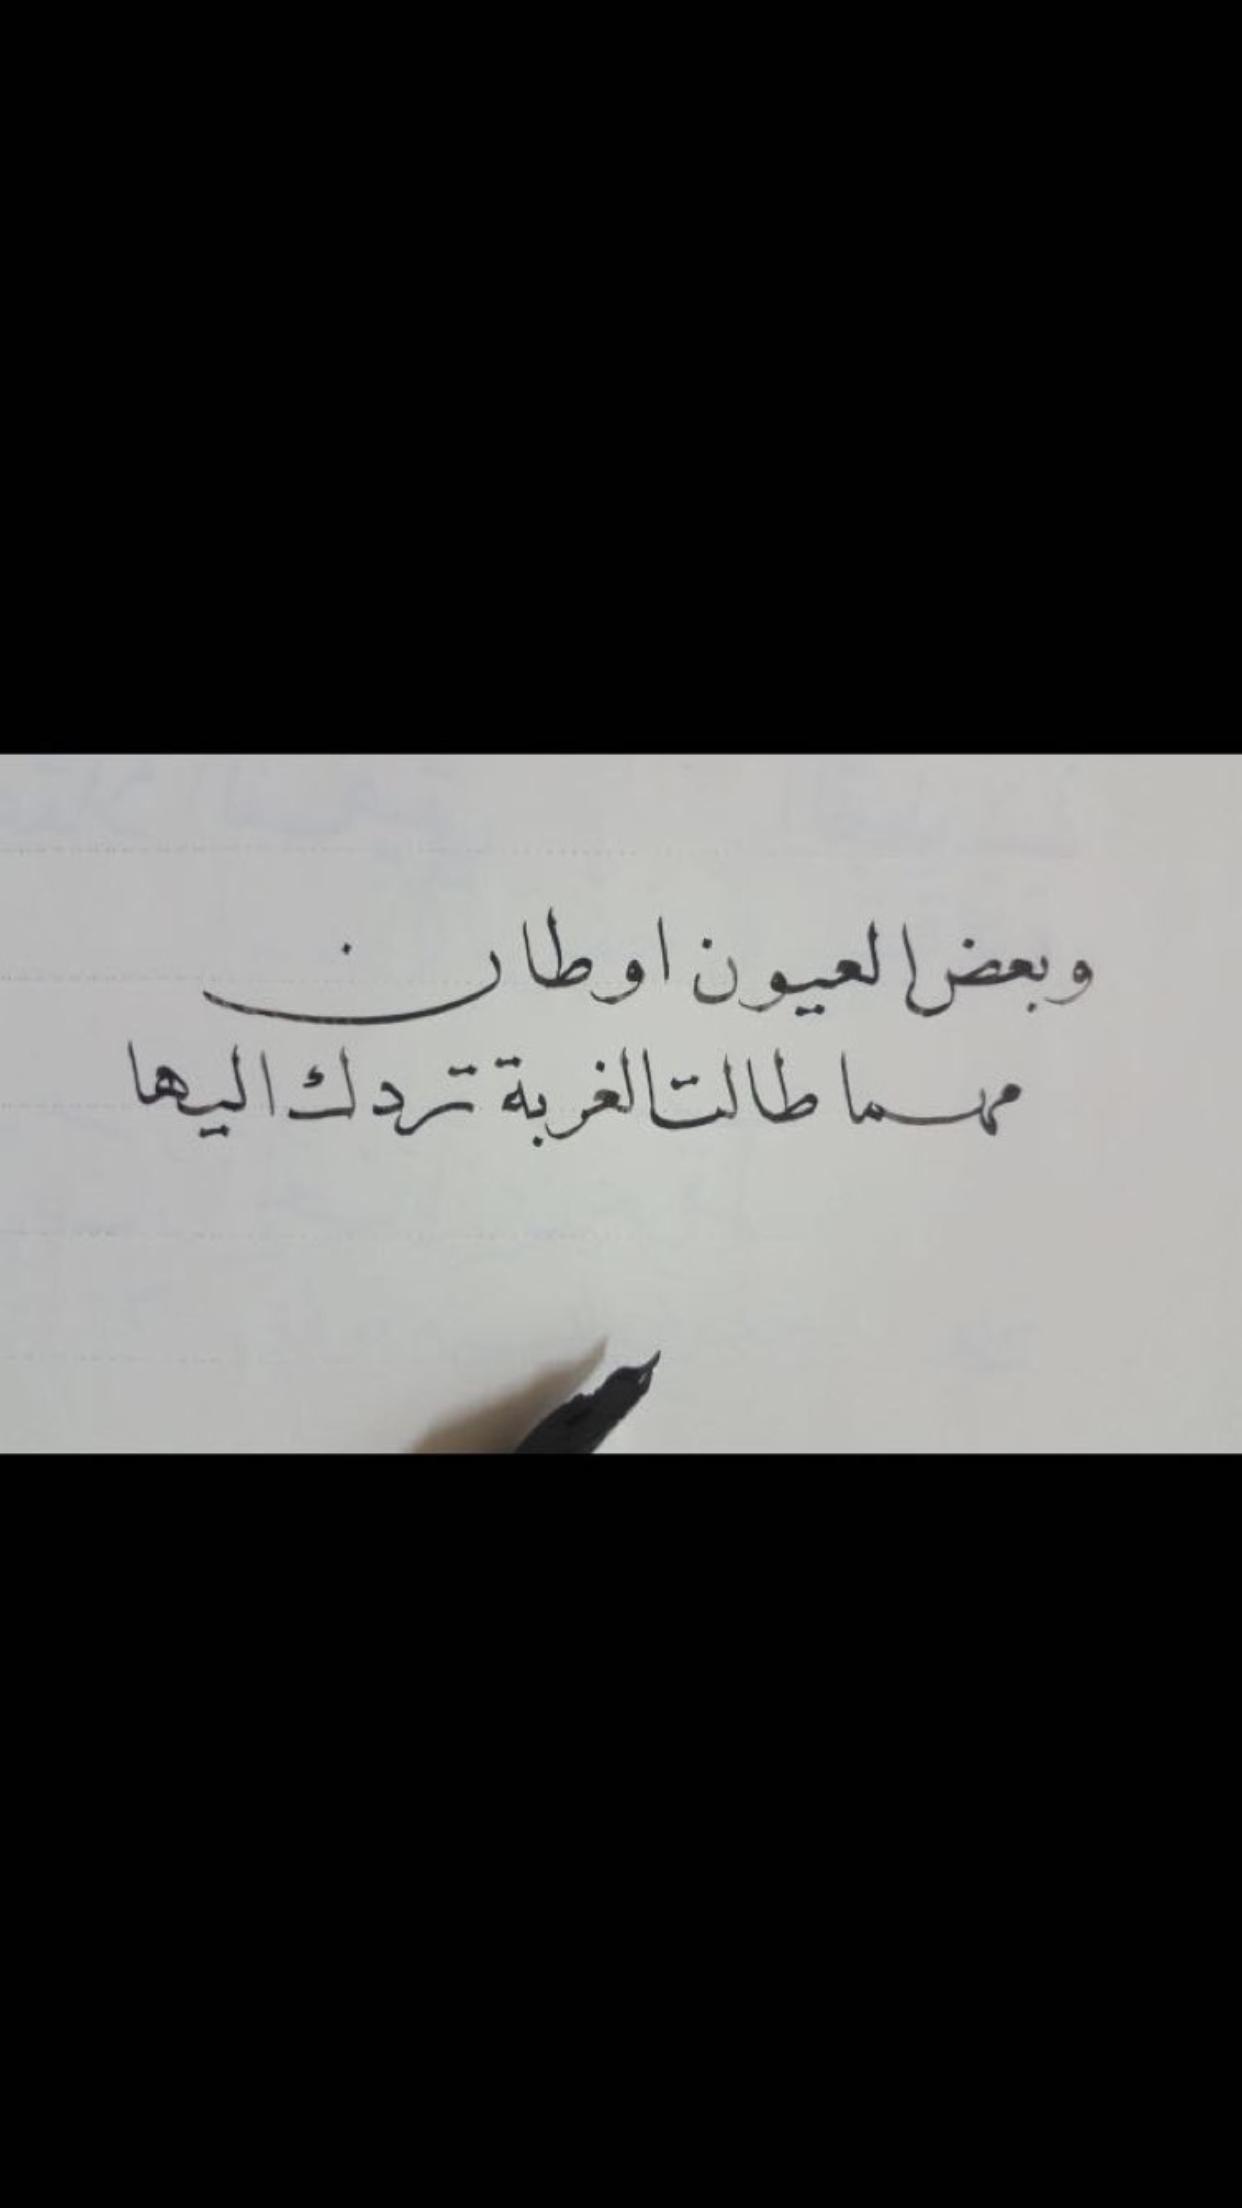 Pin By لويمش On عبارات Calligraphy Arabic Calligraphy Arabic